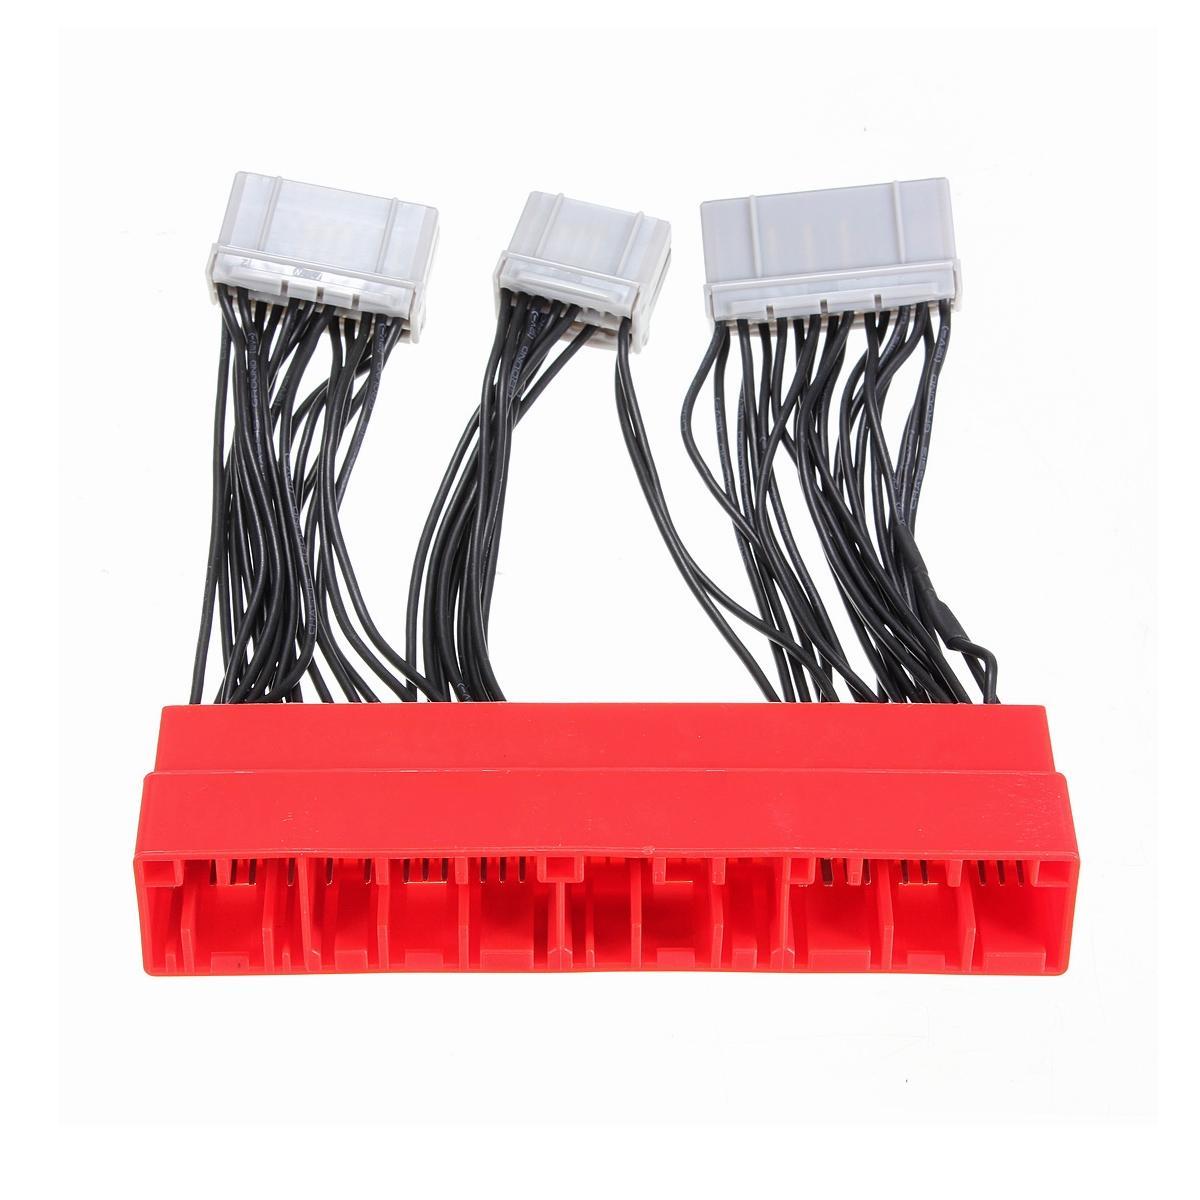 Obd2a To Obd1 Ecu Adapter Jumper Conversion Wire Harness For Honda Wiring 1 X